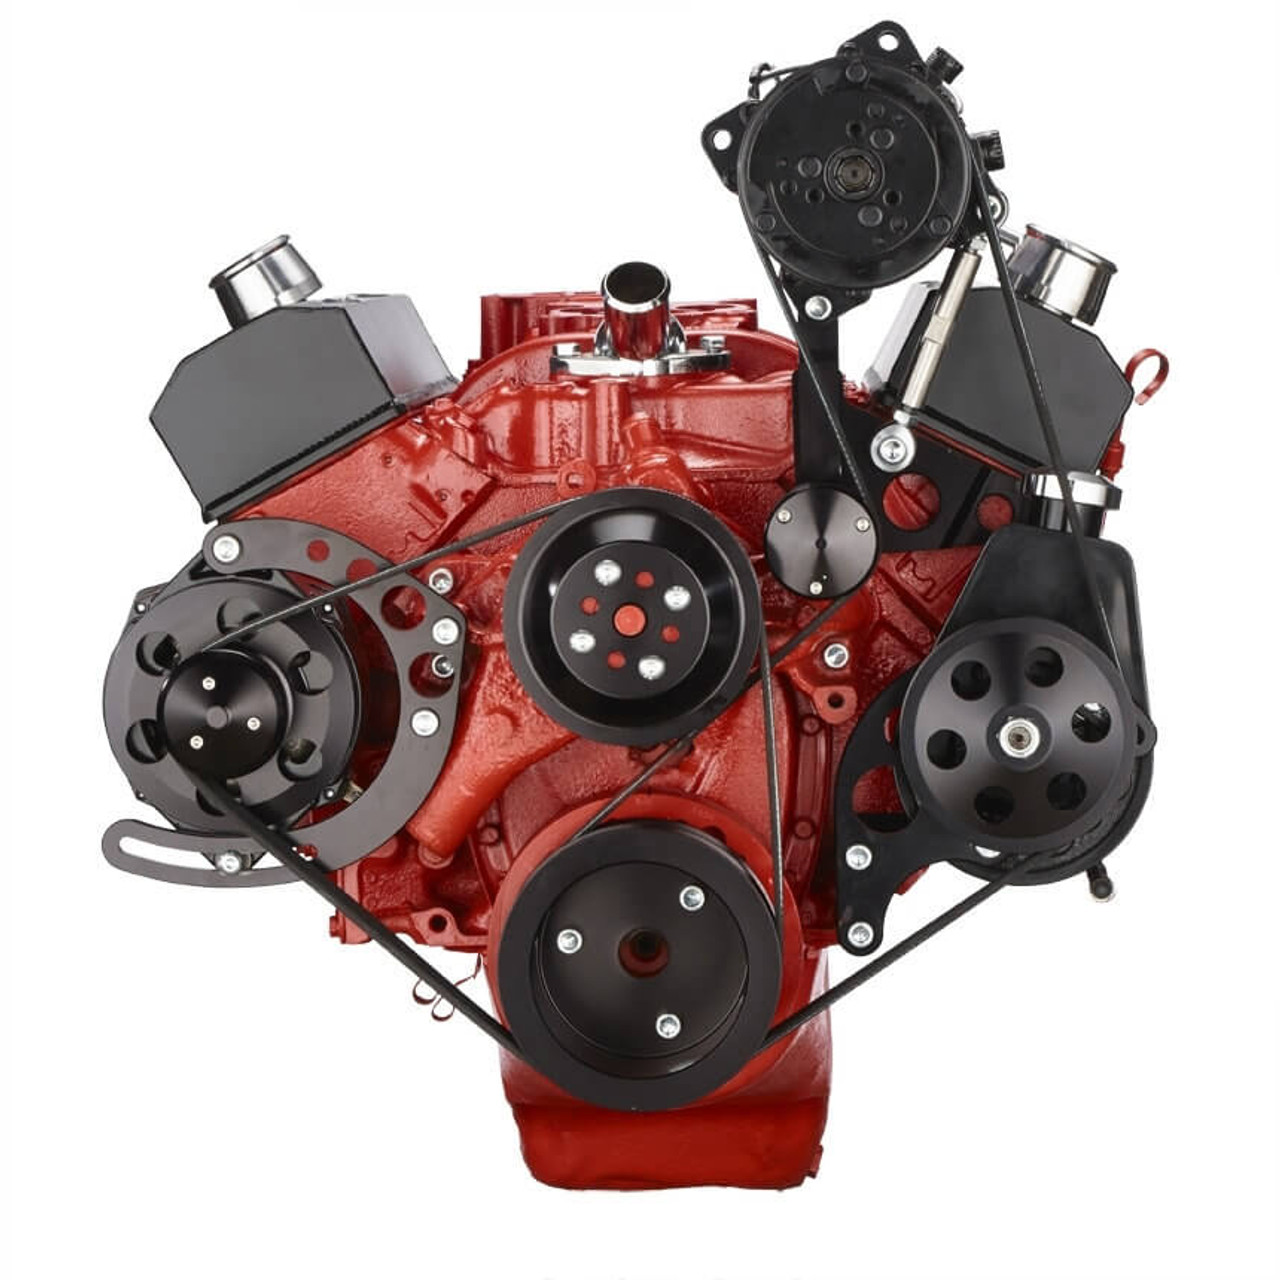 Black Chevy Small Block Serpentine Conversion - AC & Power Steering, Long  Water Pump